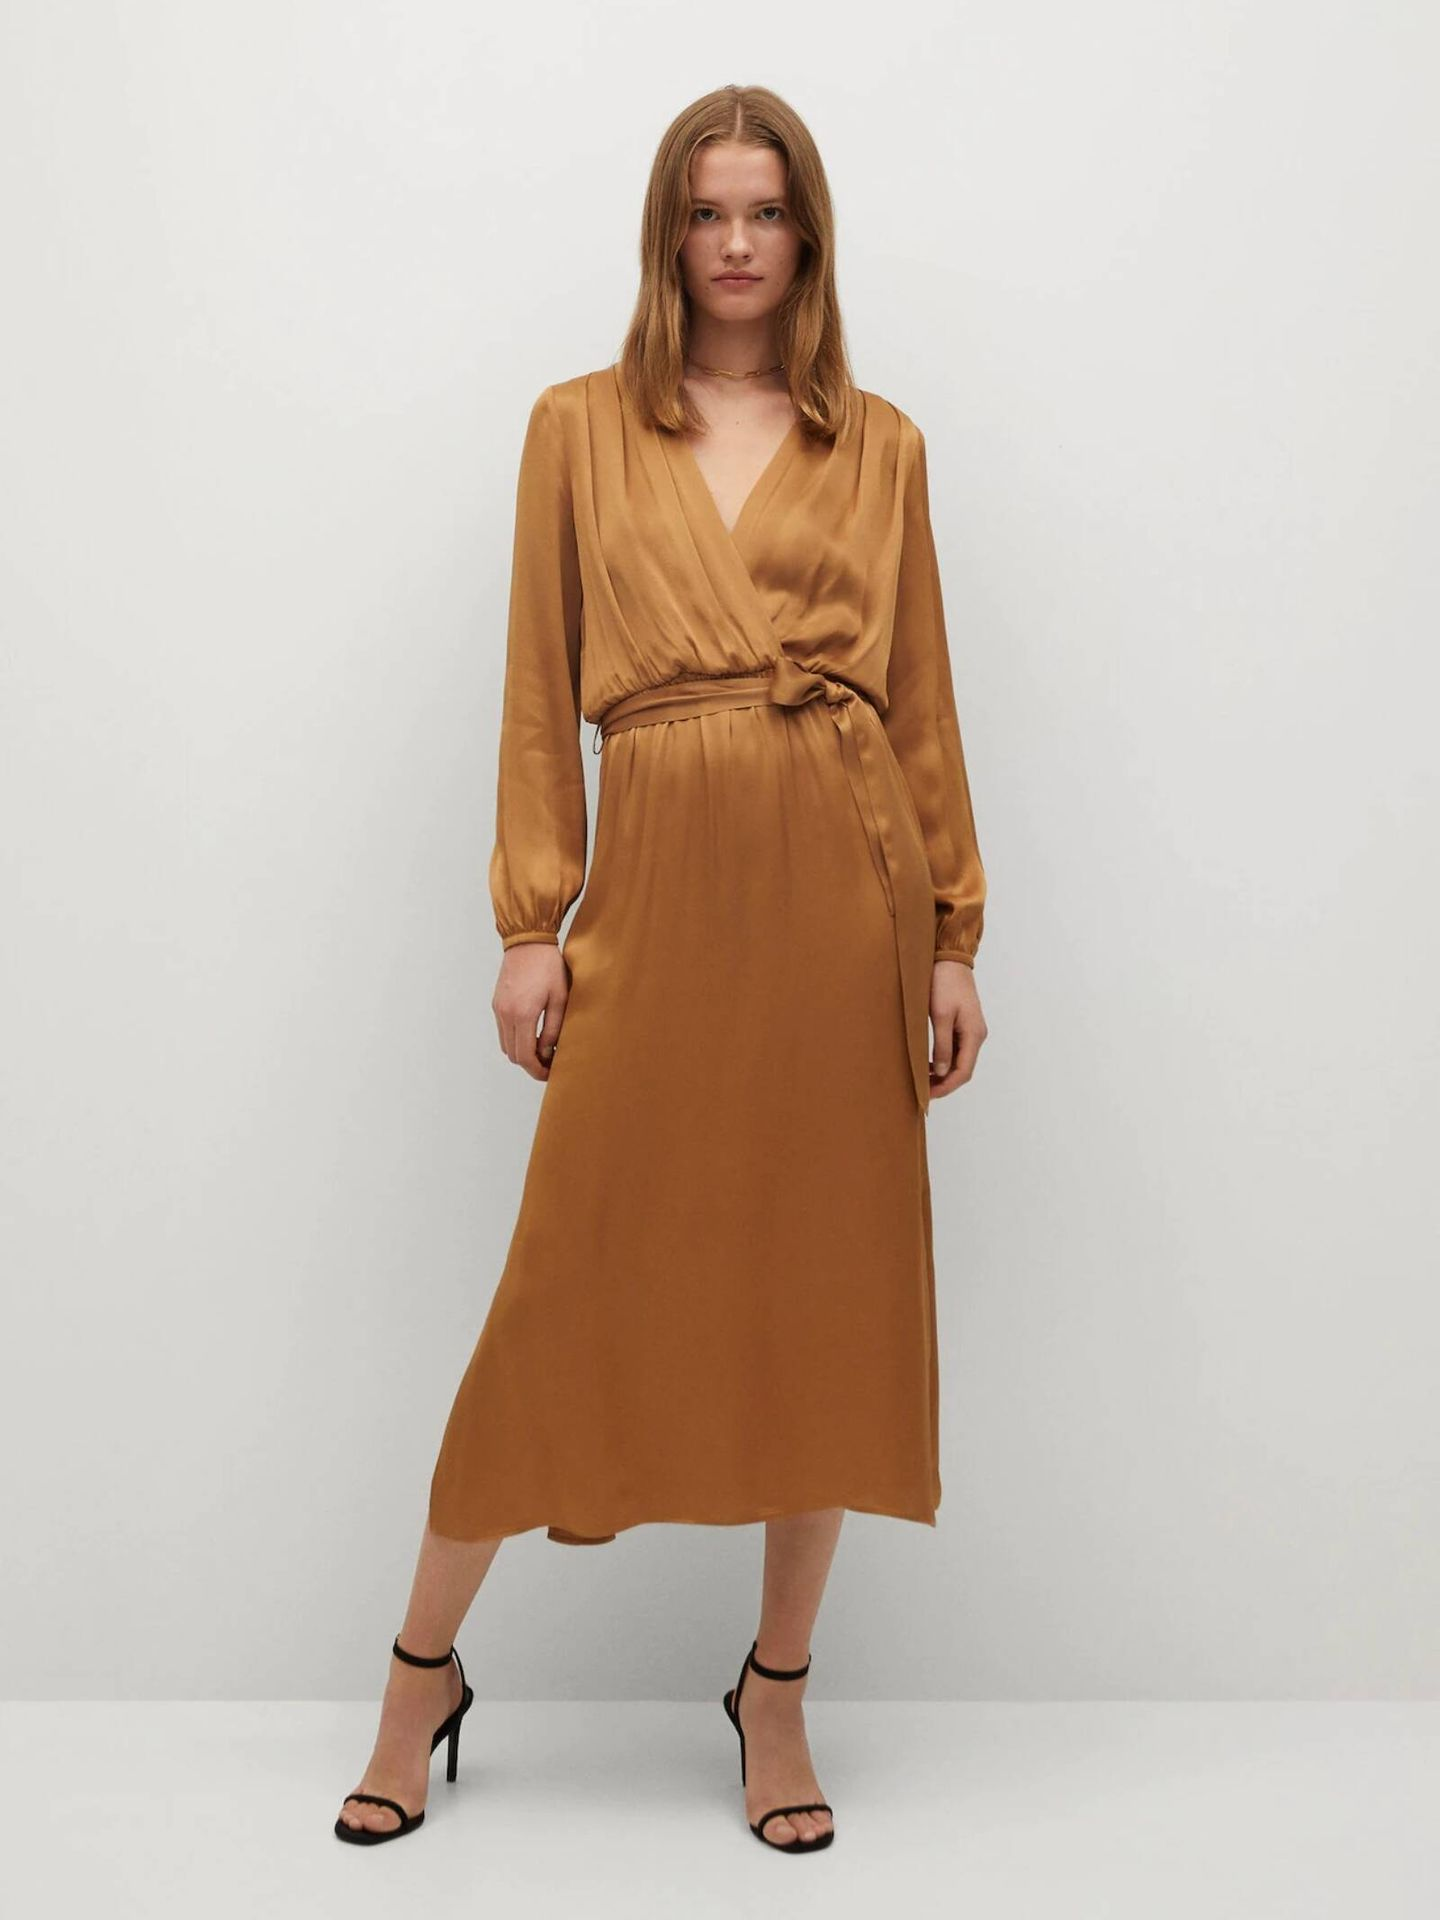 Vestido 'wrap dress' de Mango Outlet. (Cortesía)